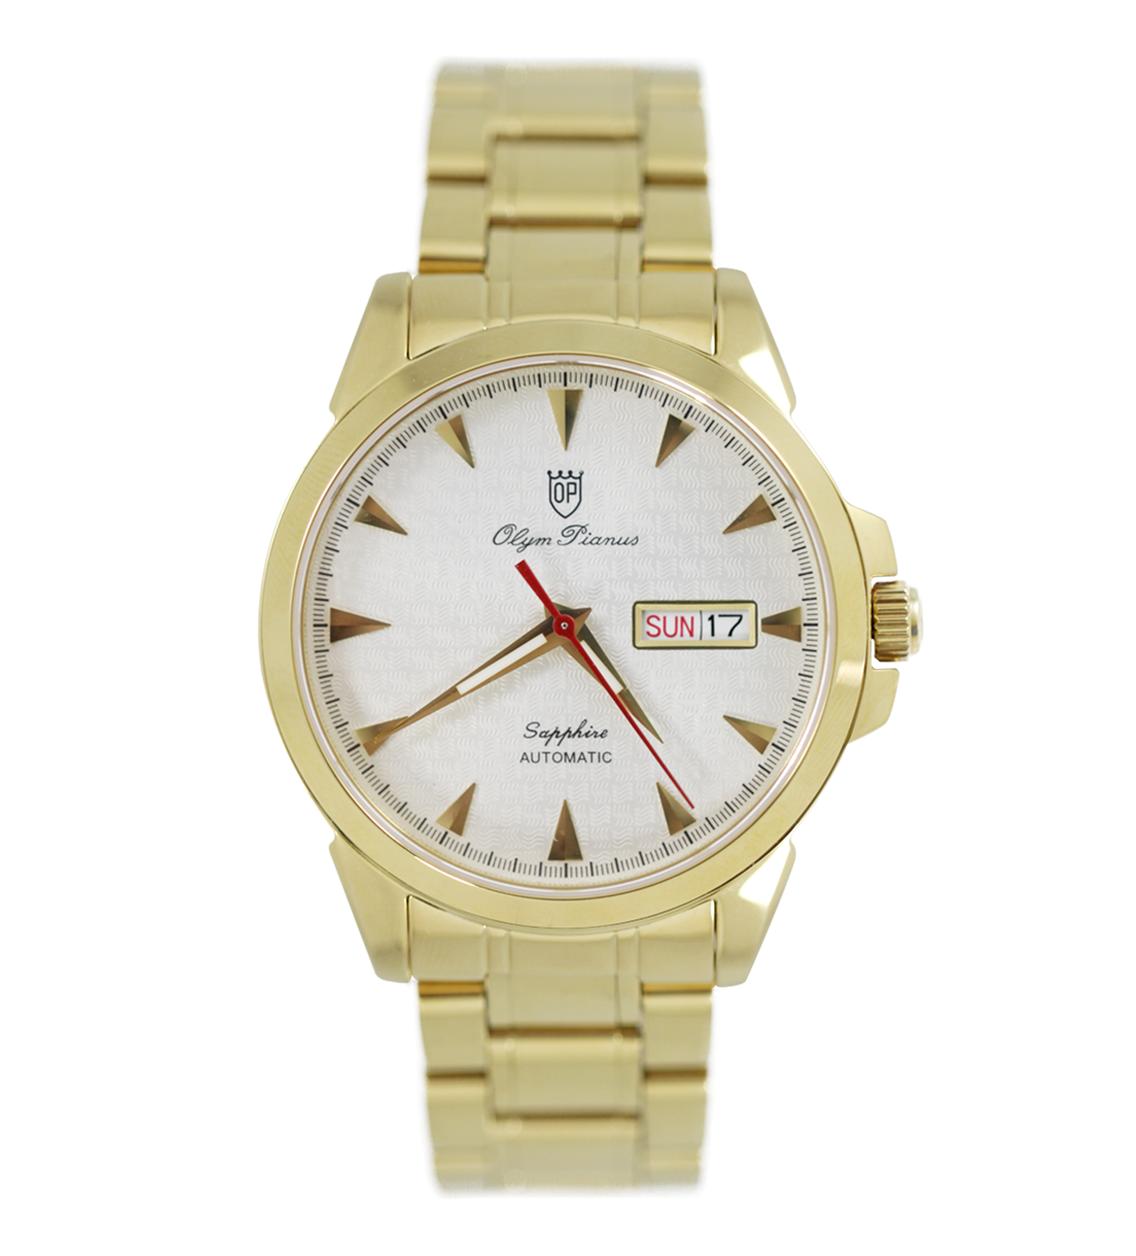 Đồng hồ nam Olym Pianus Gold OP990-08AMK-T